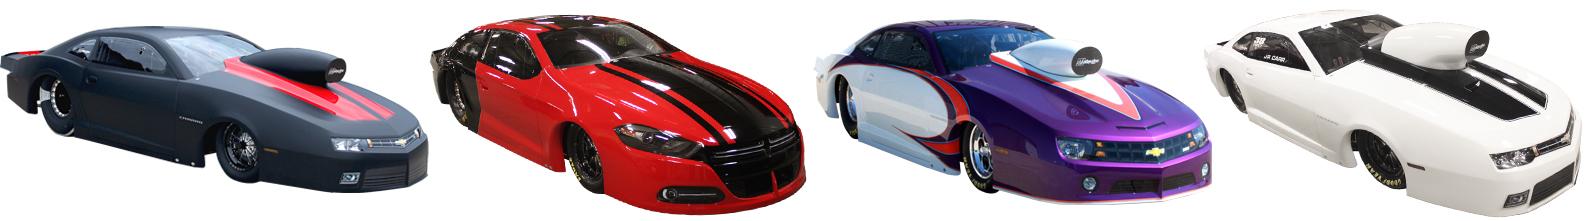 pro-stock-cars.jpg